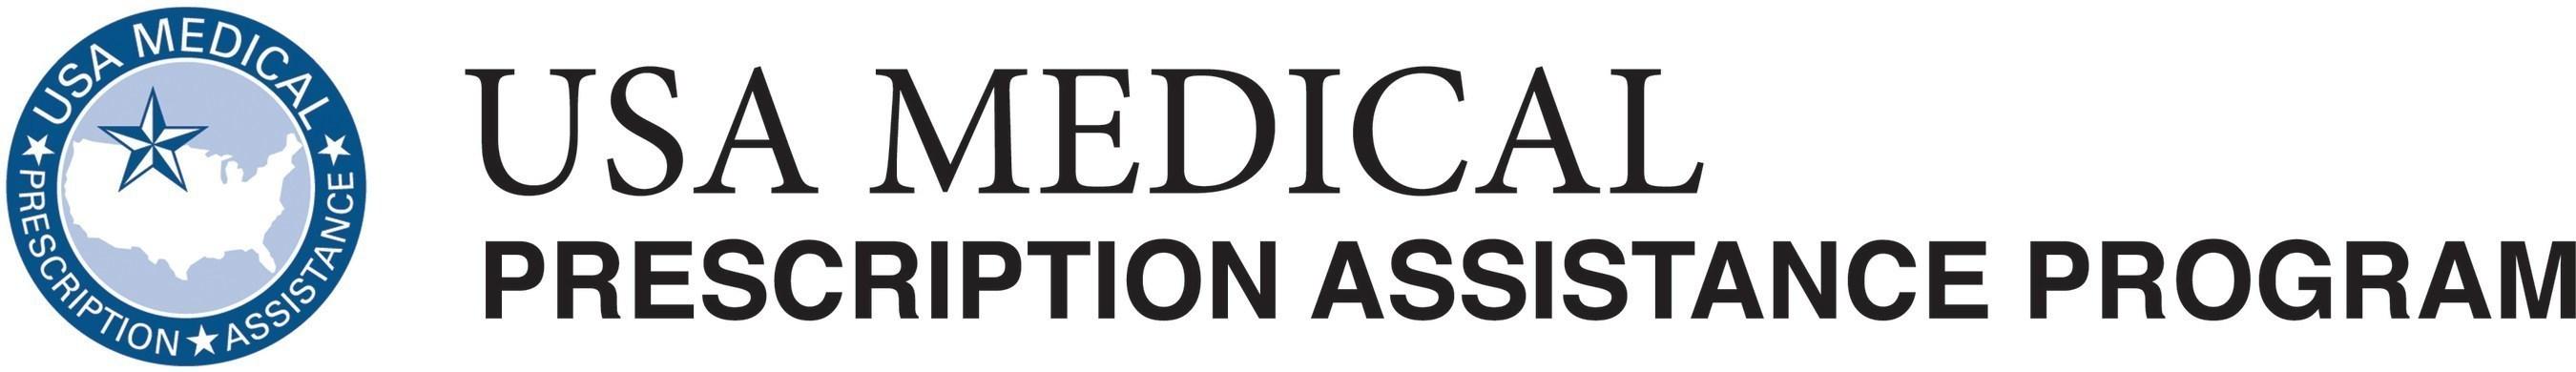 USA Medical Prescription Assistance Program